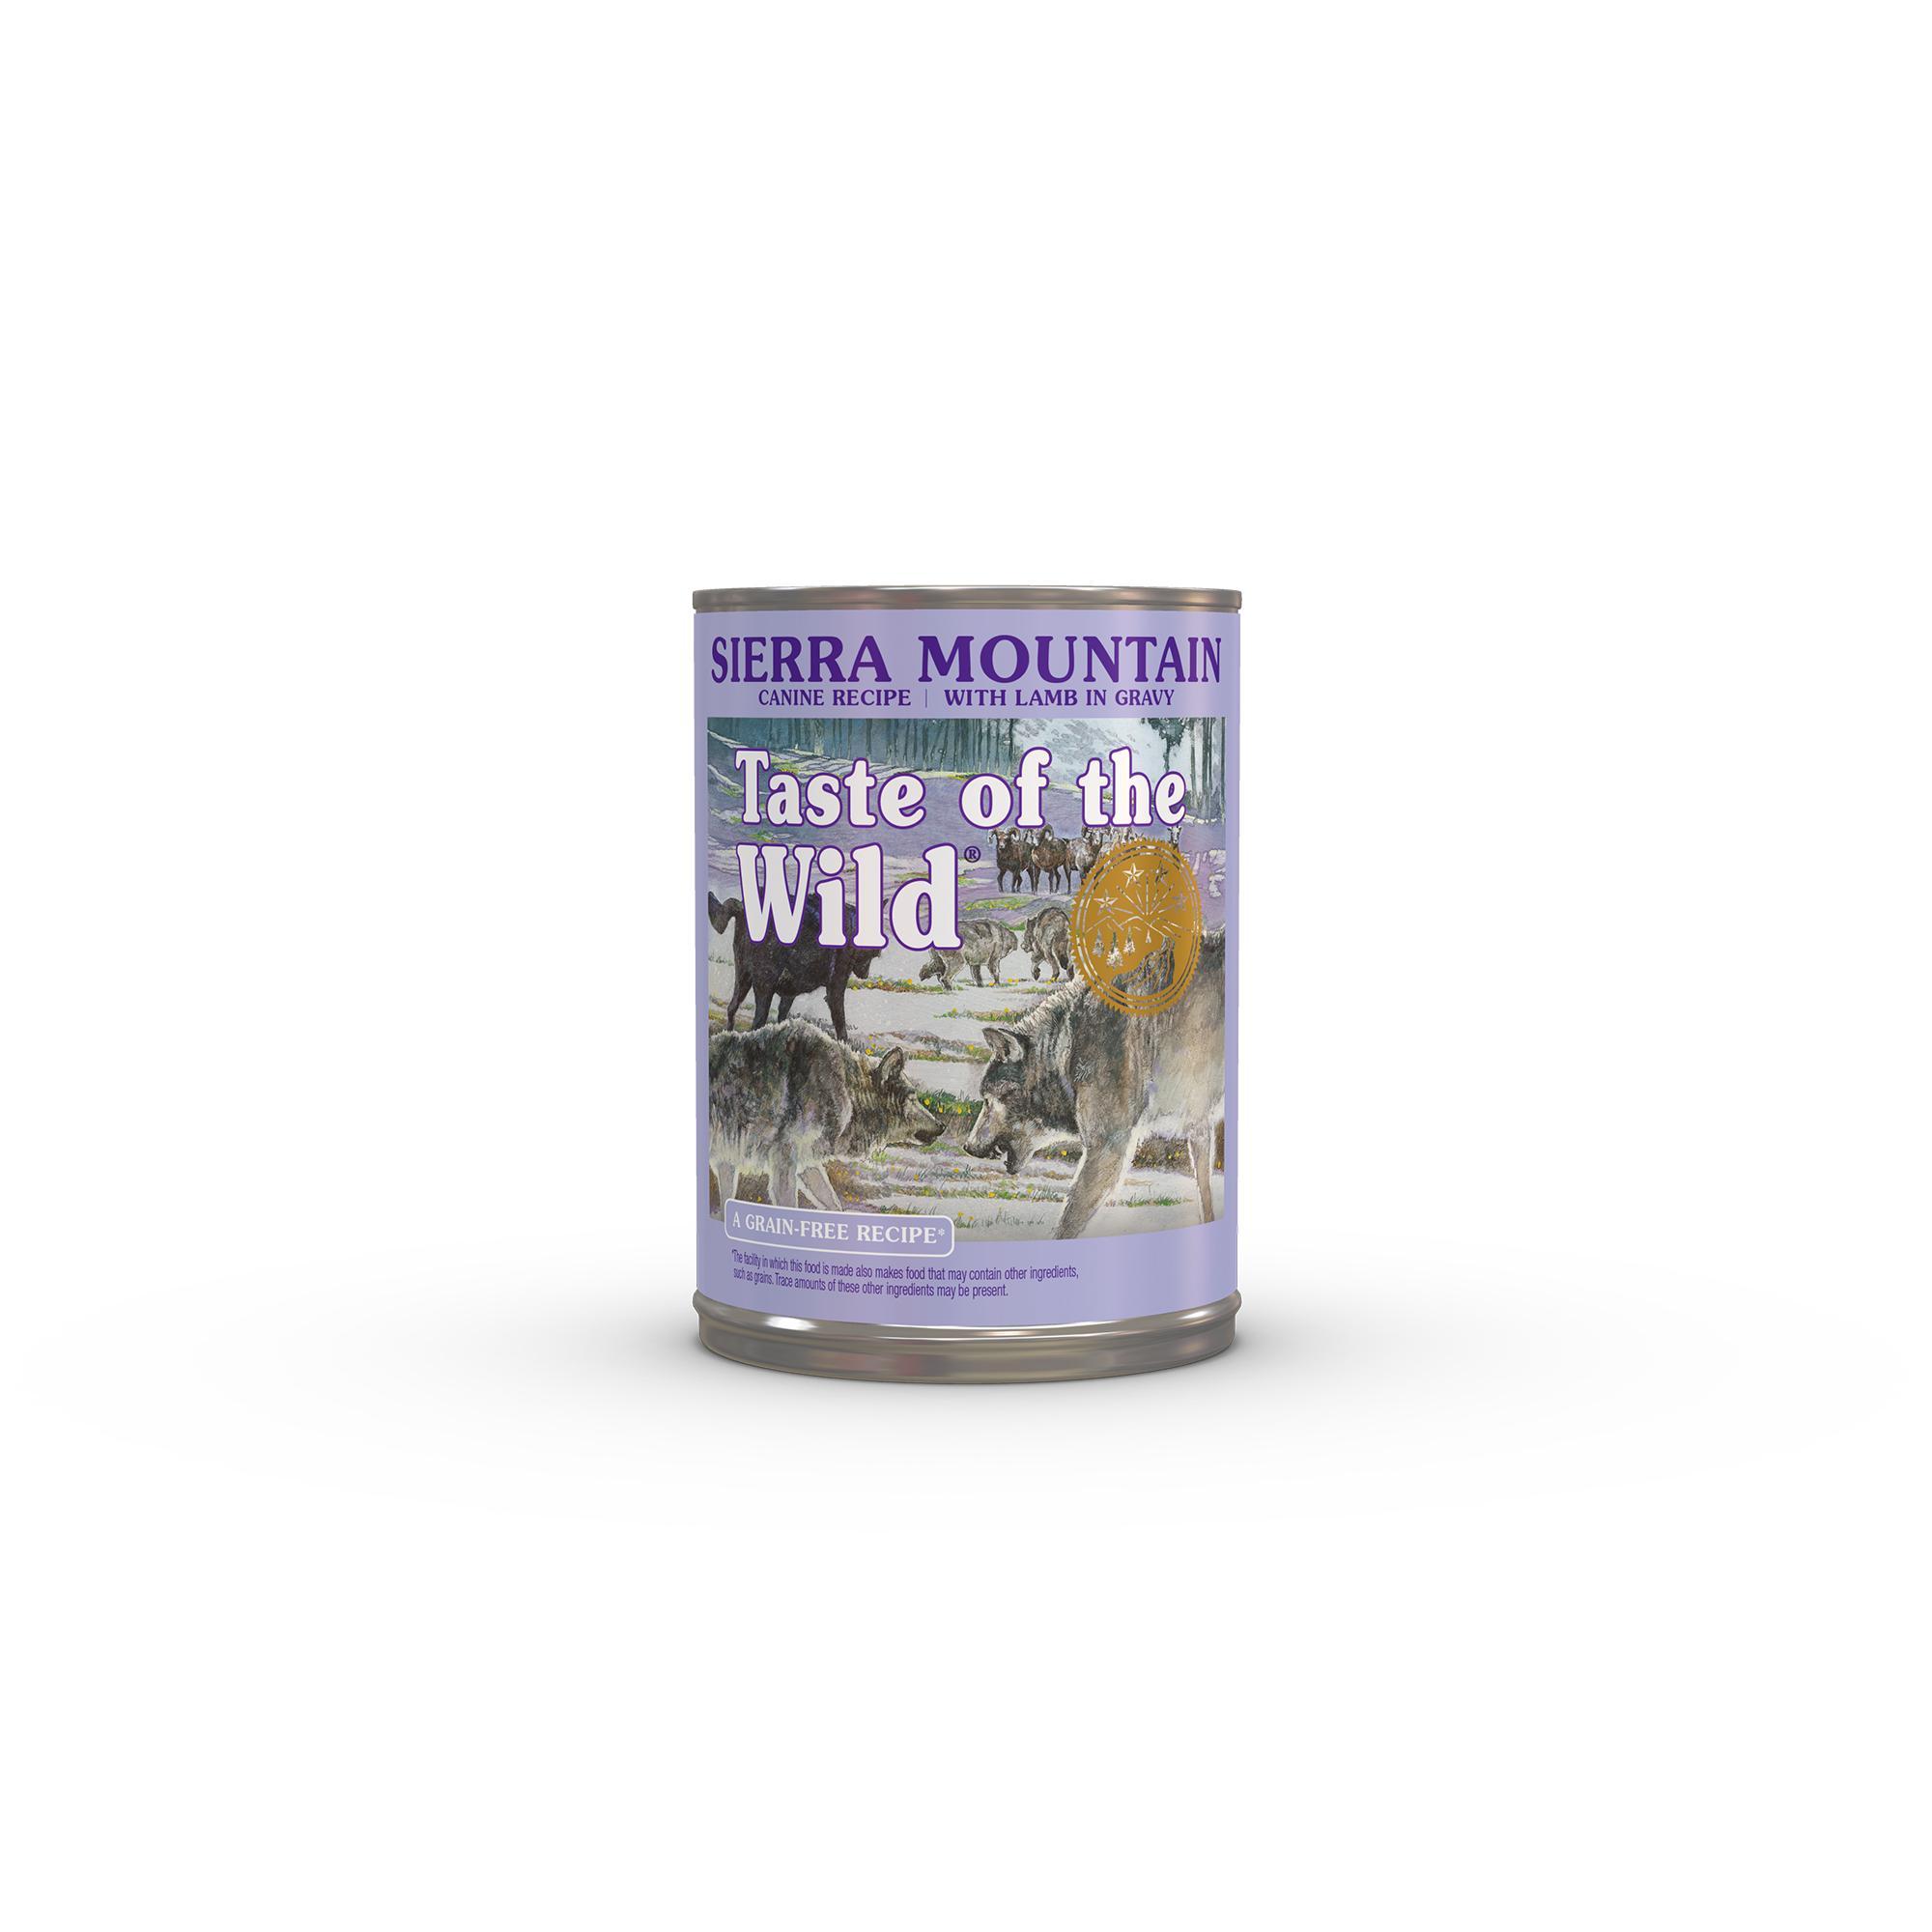 Taste of the Wild Sierra Mountain Grain-Free Canned Dog Food, 13.2-oz